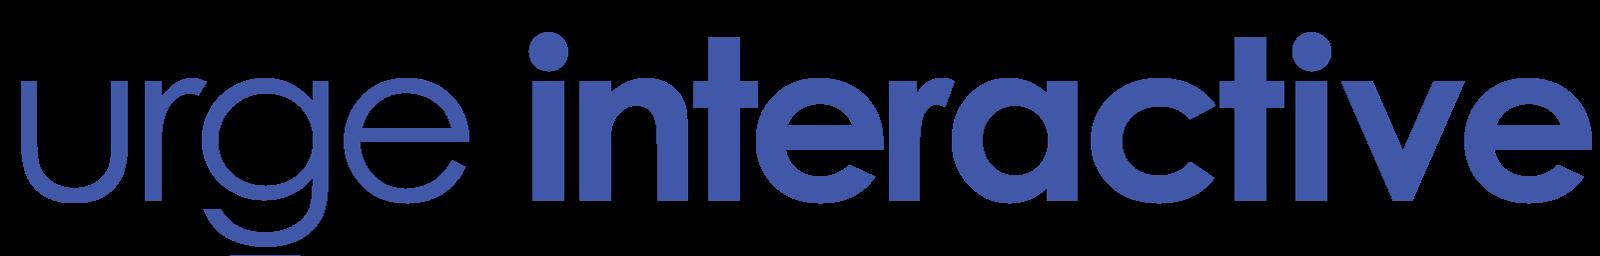 Urge Interactive